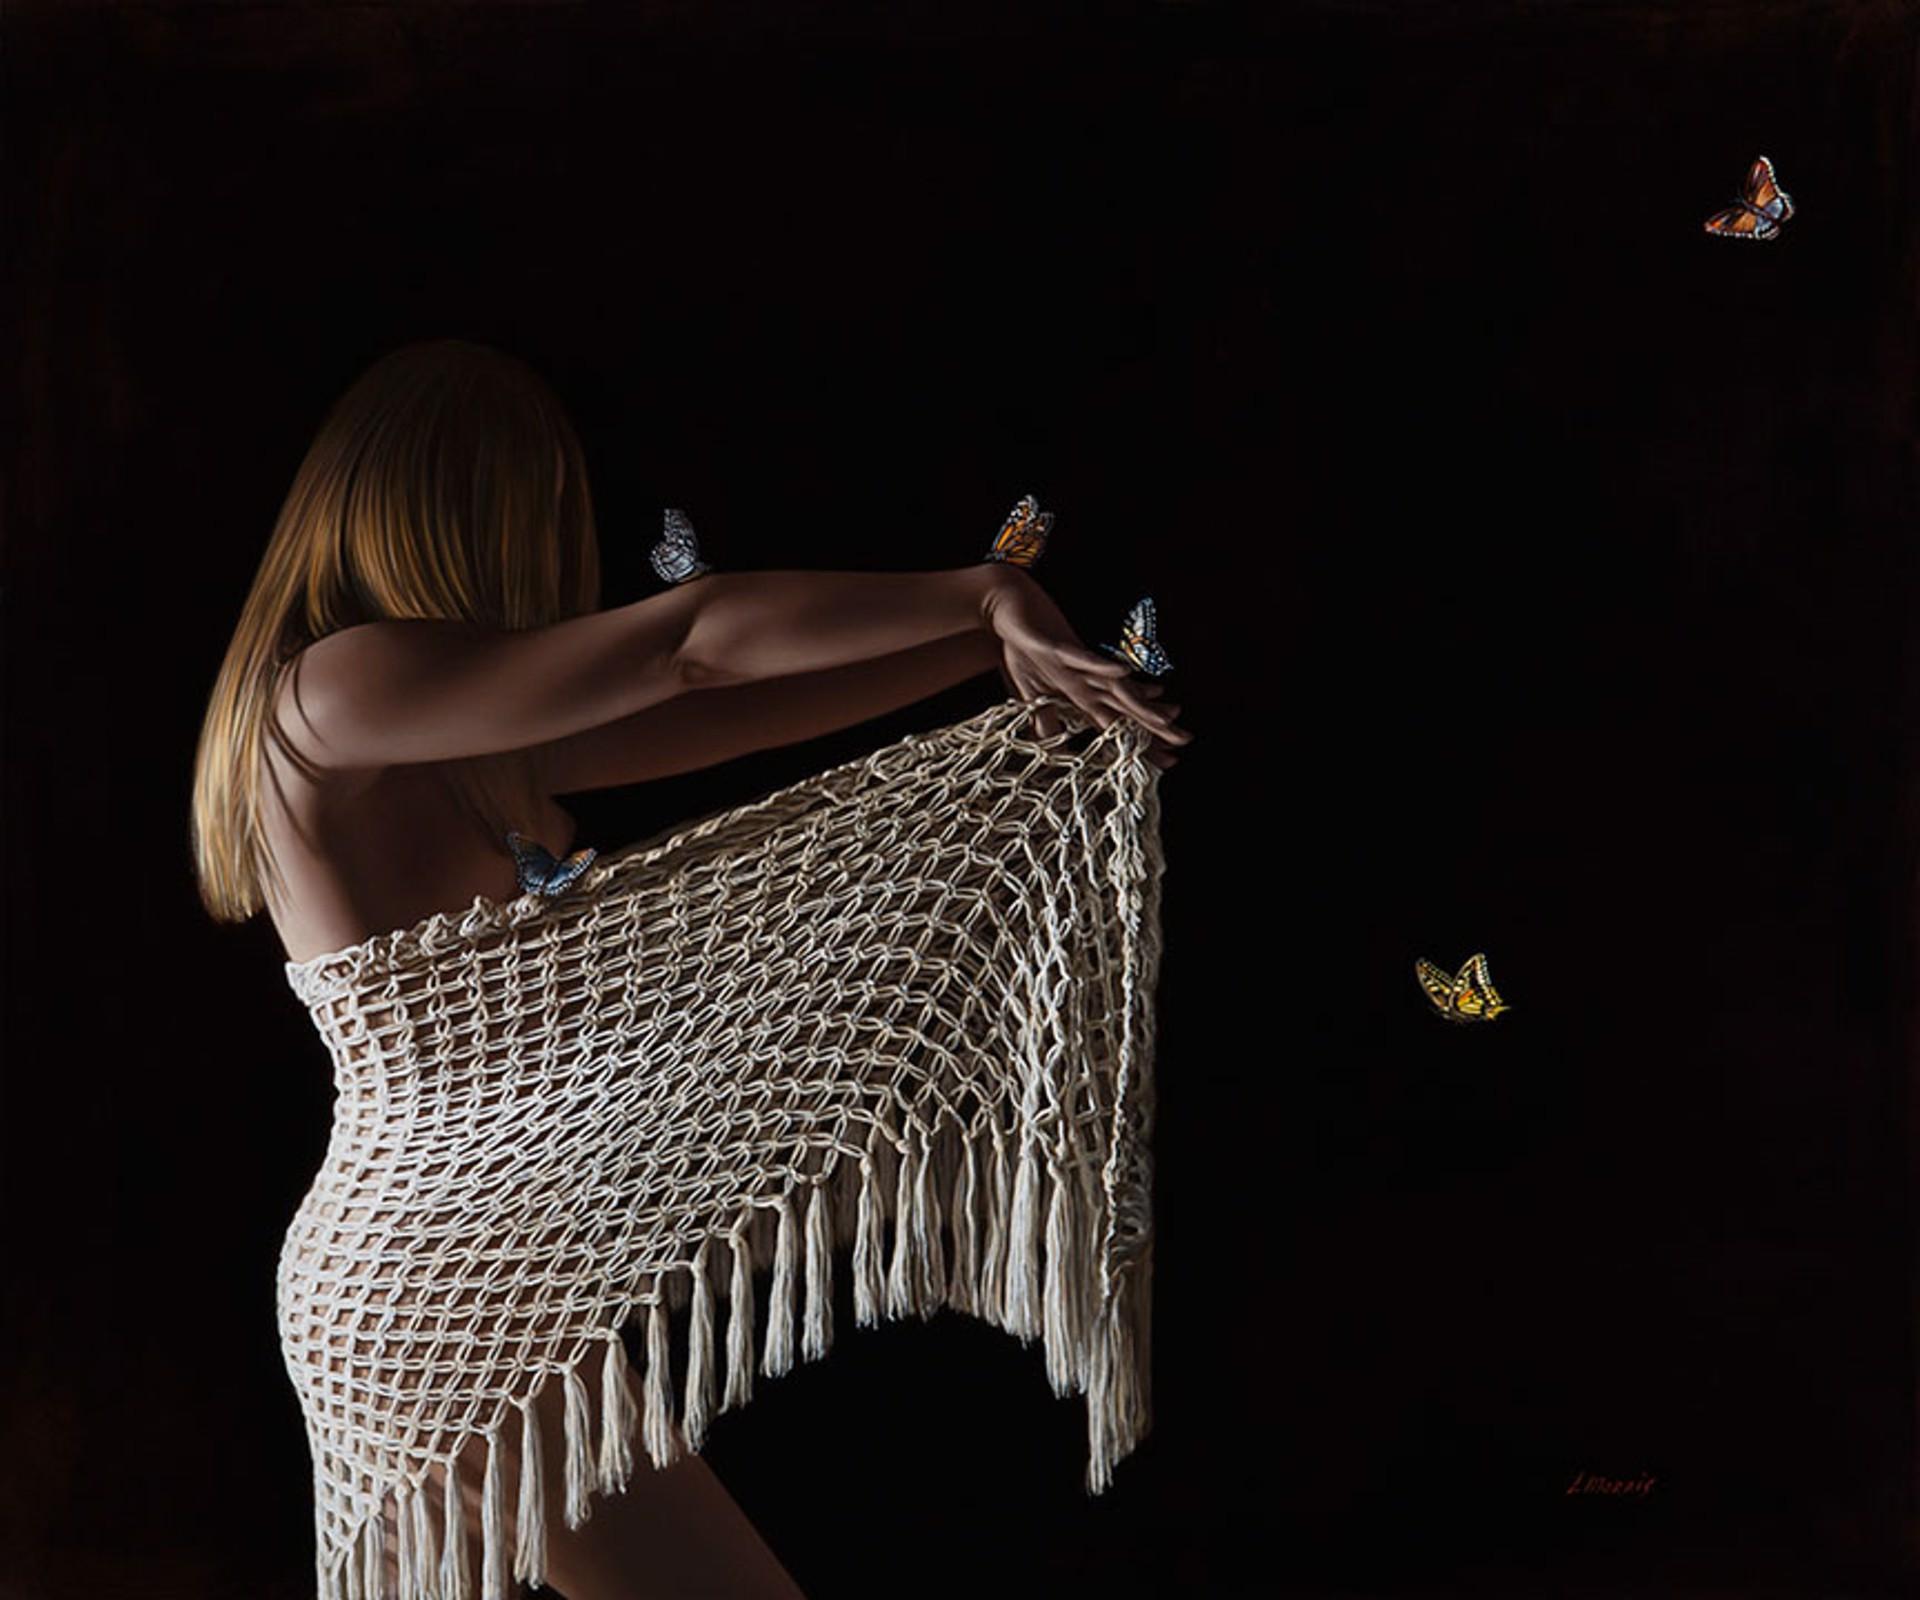 Shadowbox by Larissa Morais